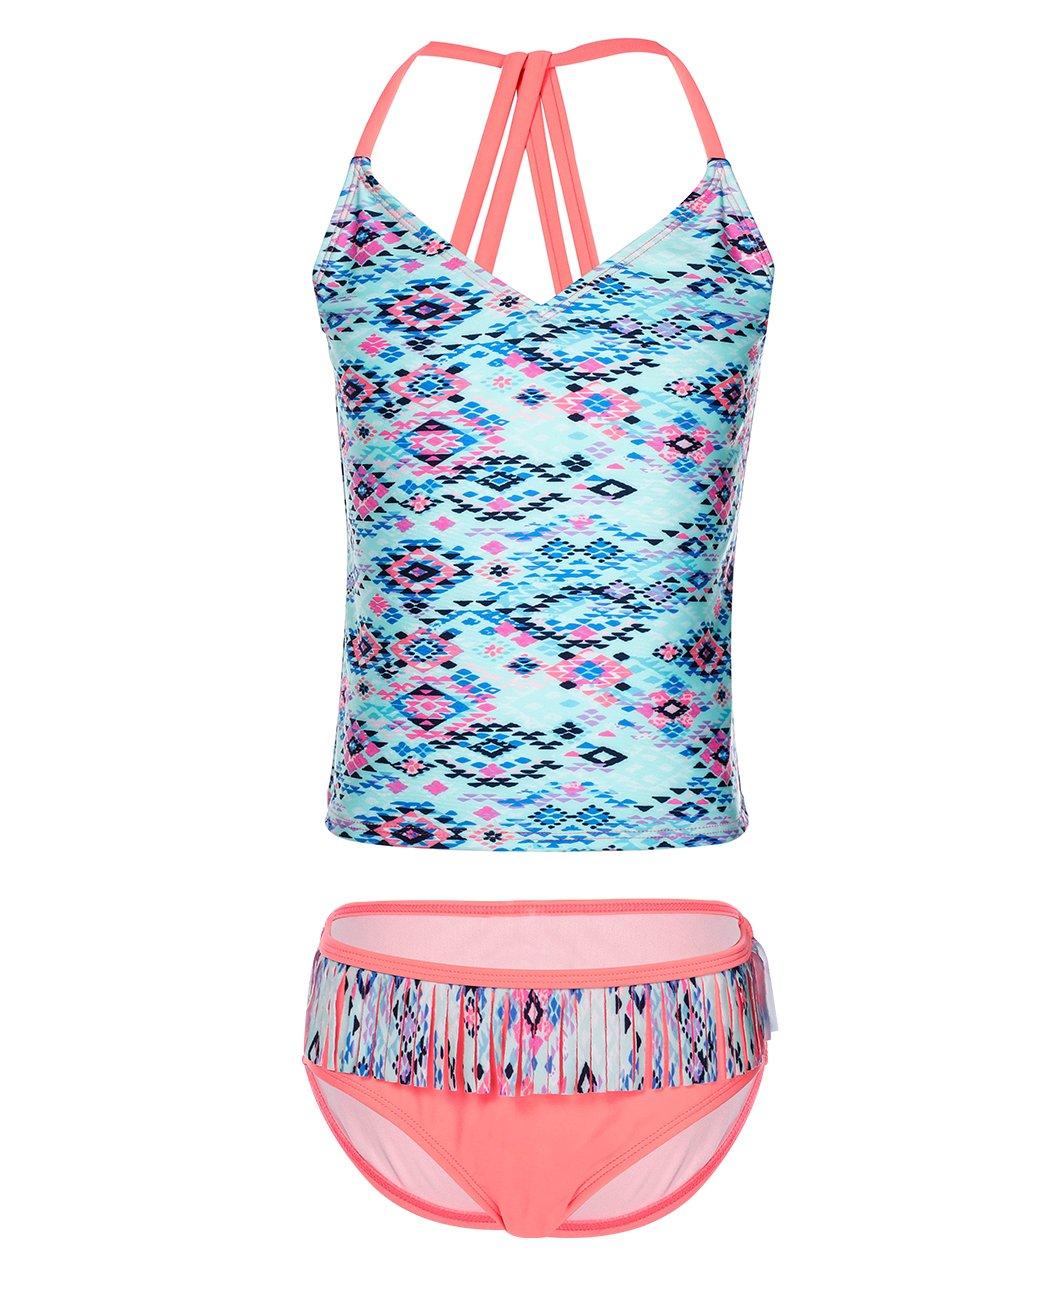 Girls Swimwear, Two Piece Rash Guard Criss Cross Swimsuits